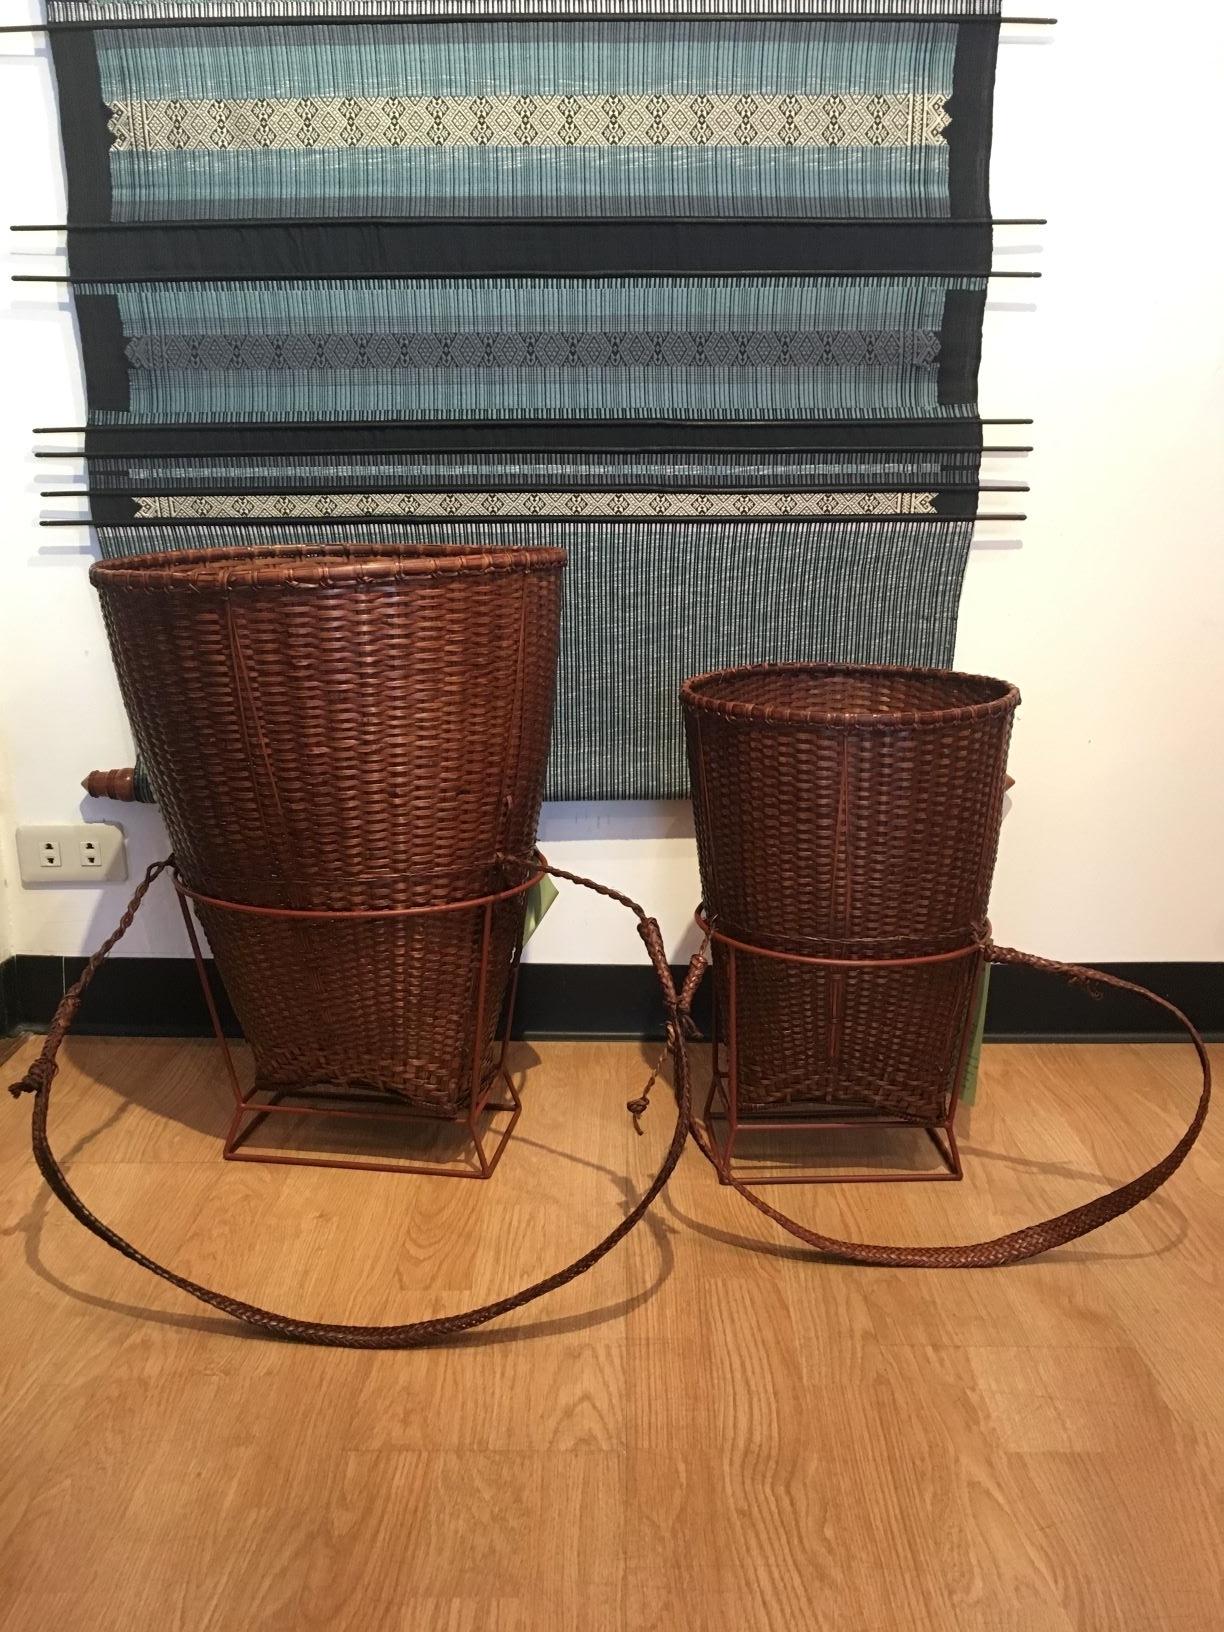 baskets_2018112202063952e.jpg